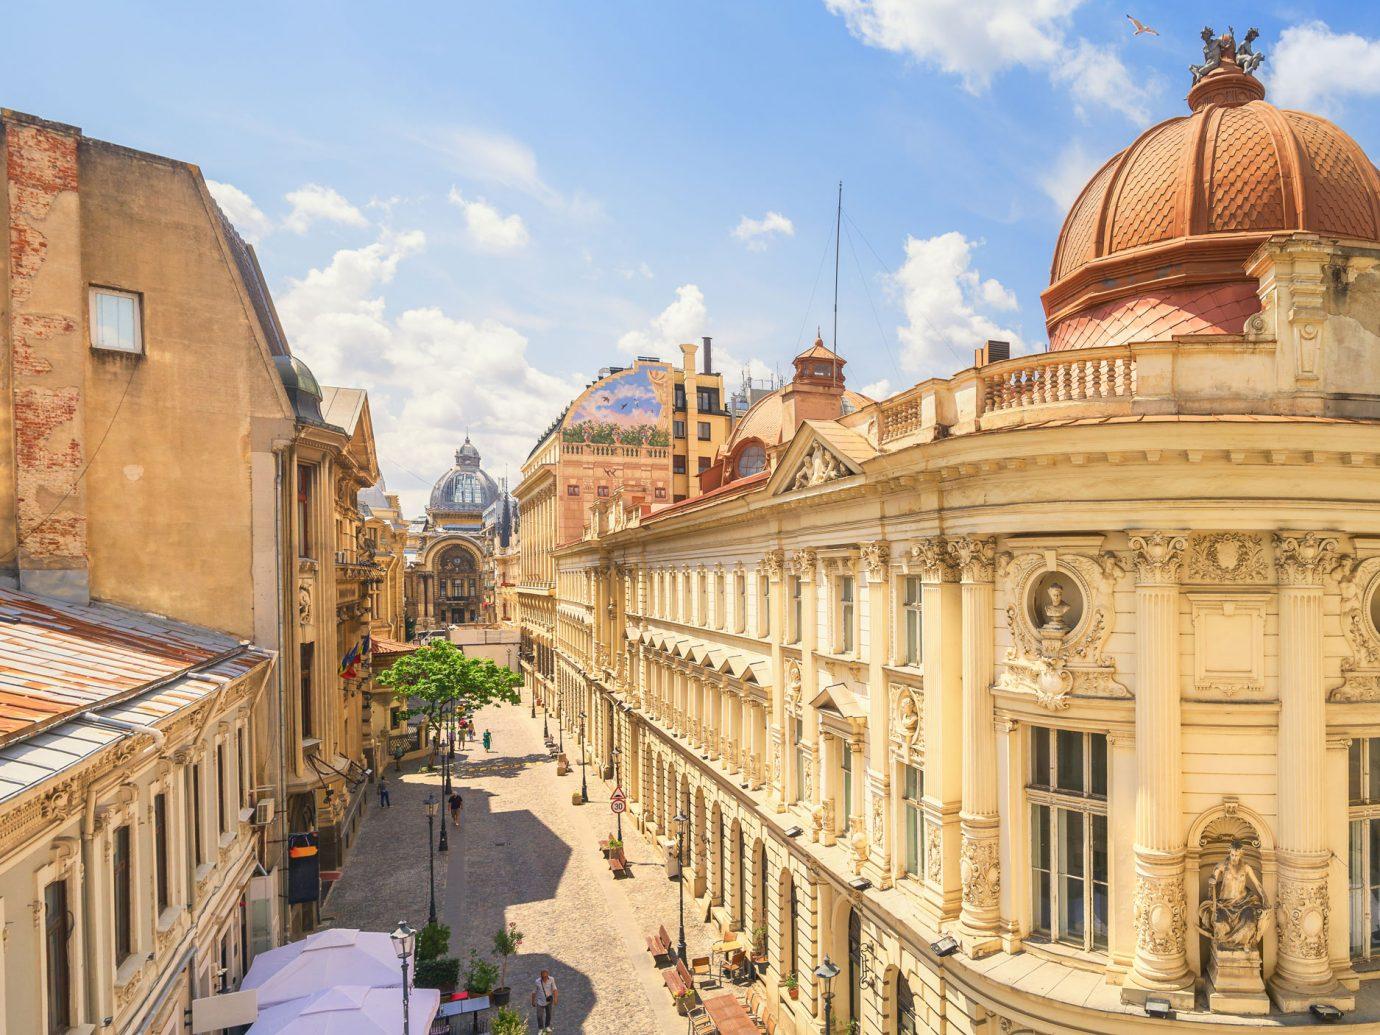 street view of Bucharest, Romania